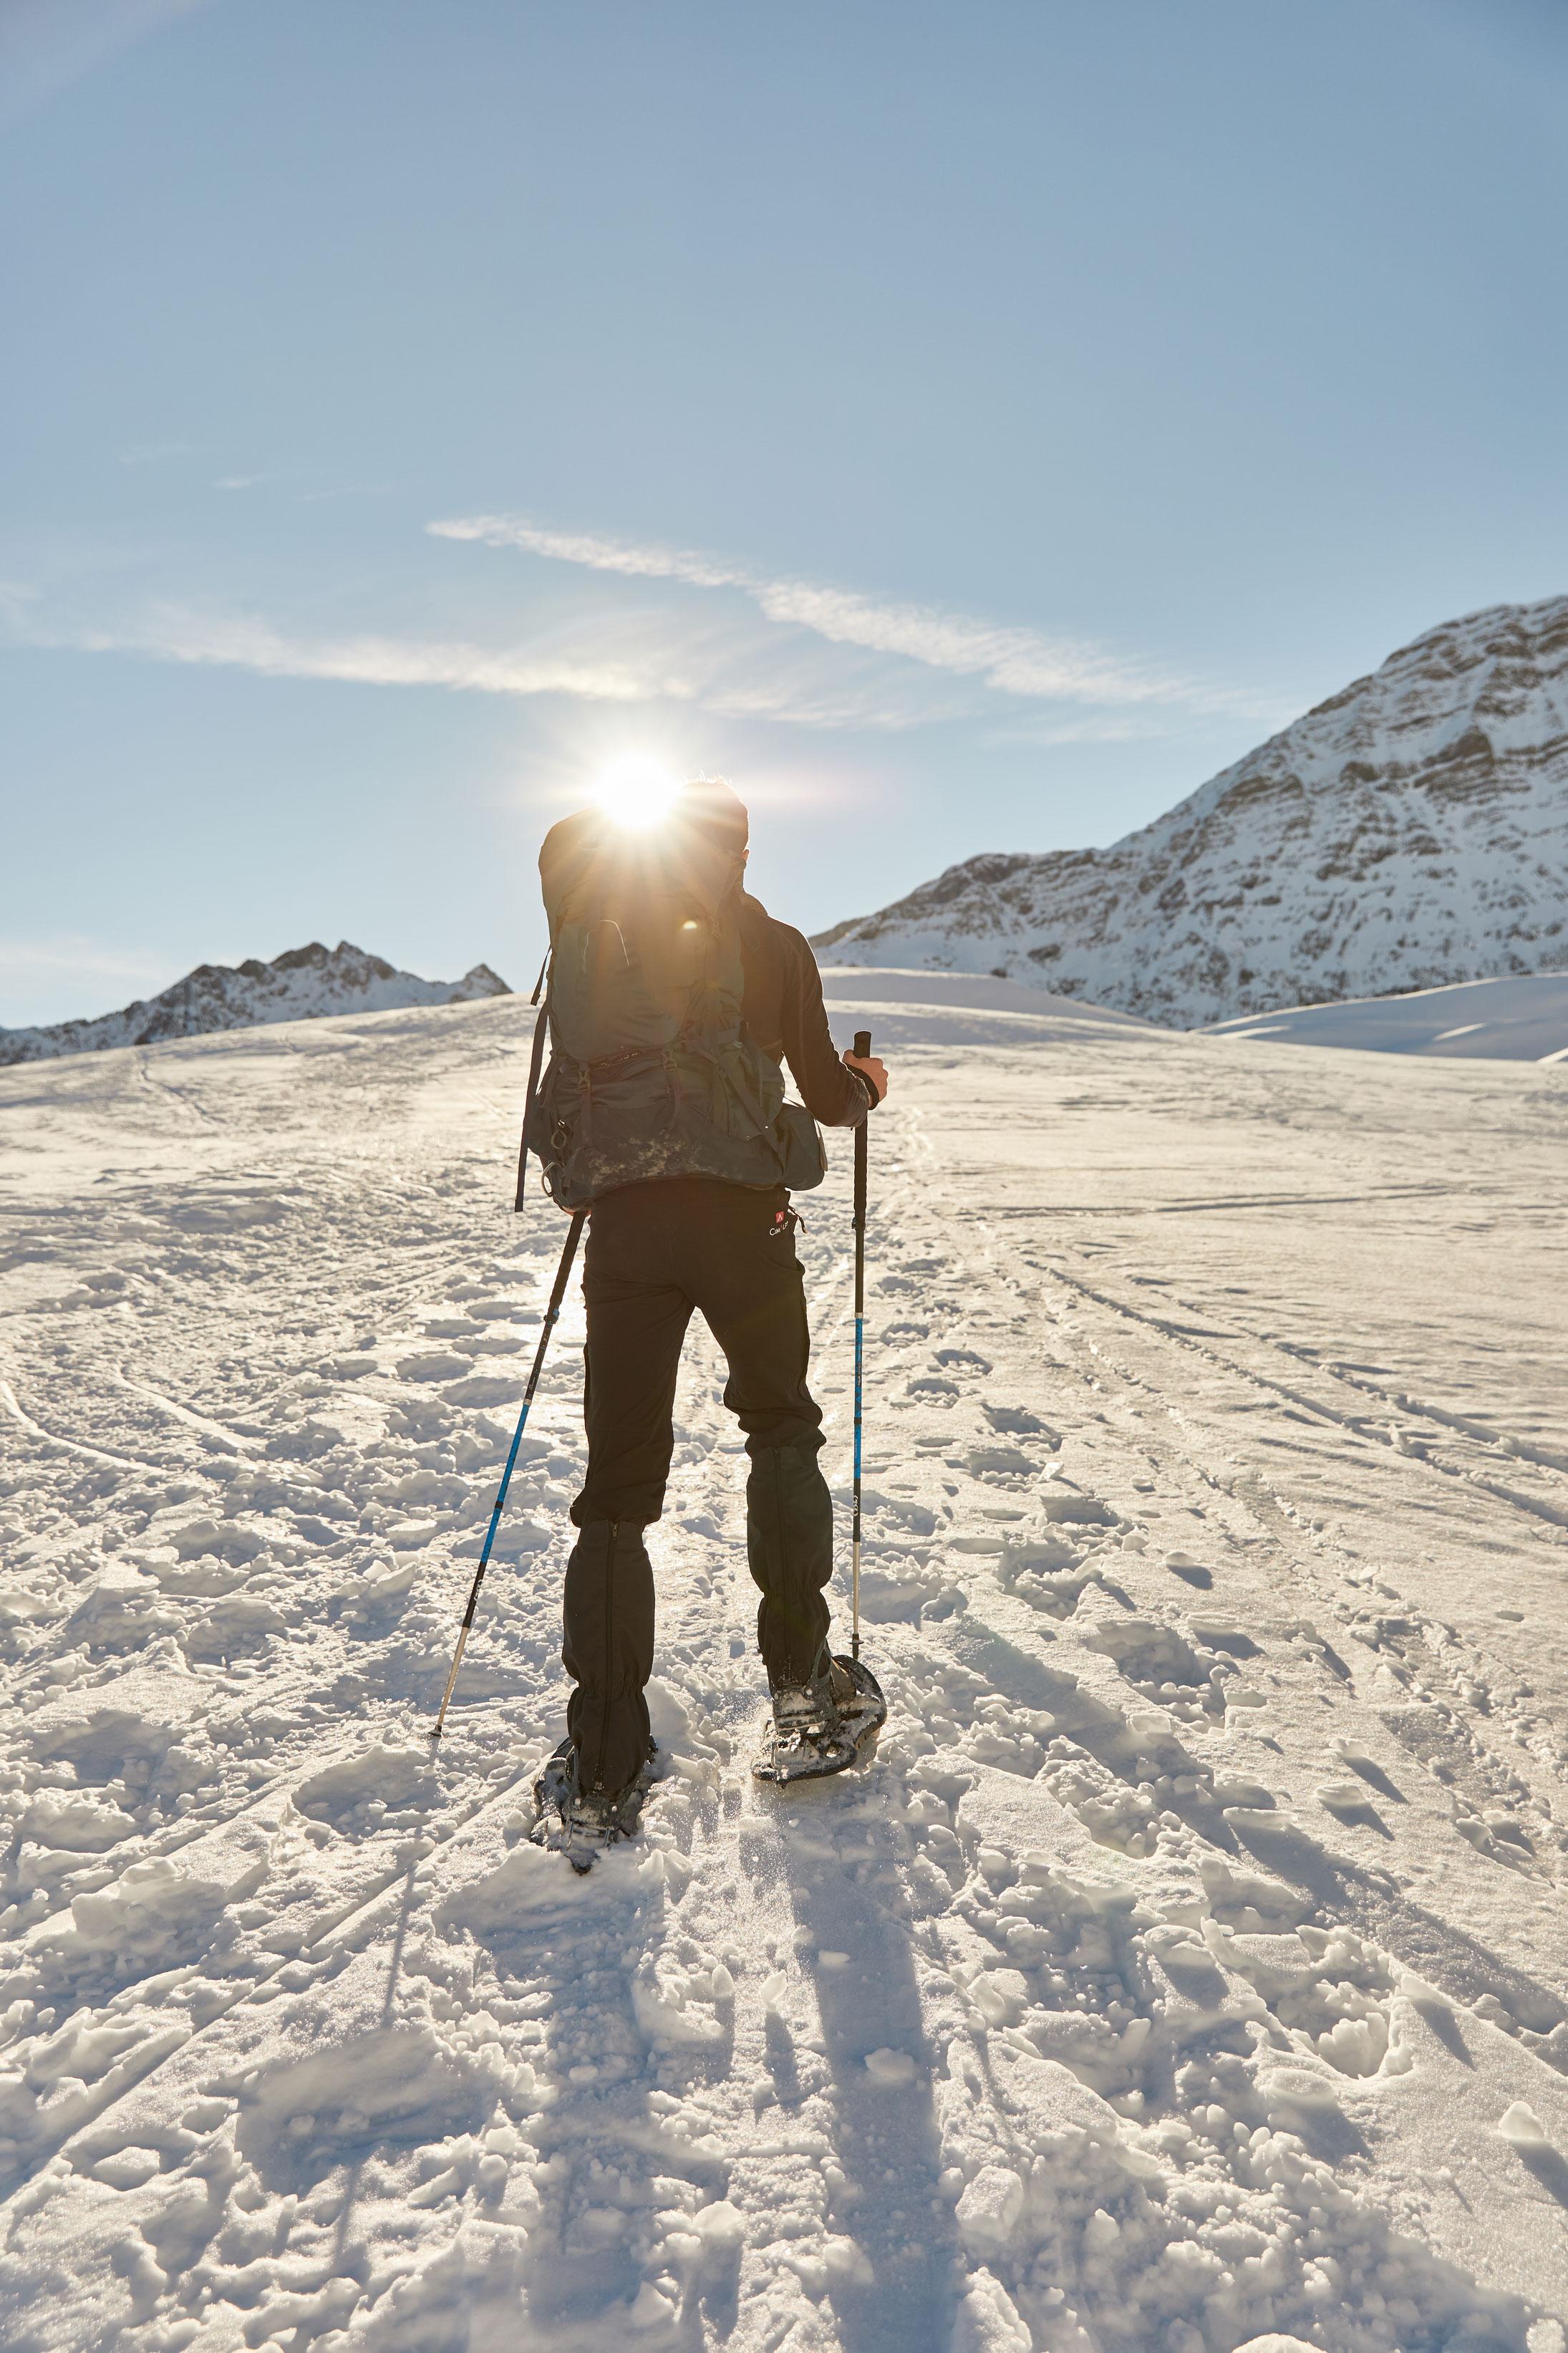 photographe expedition rando montagne